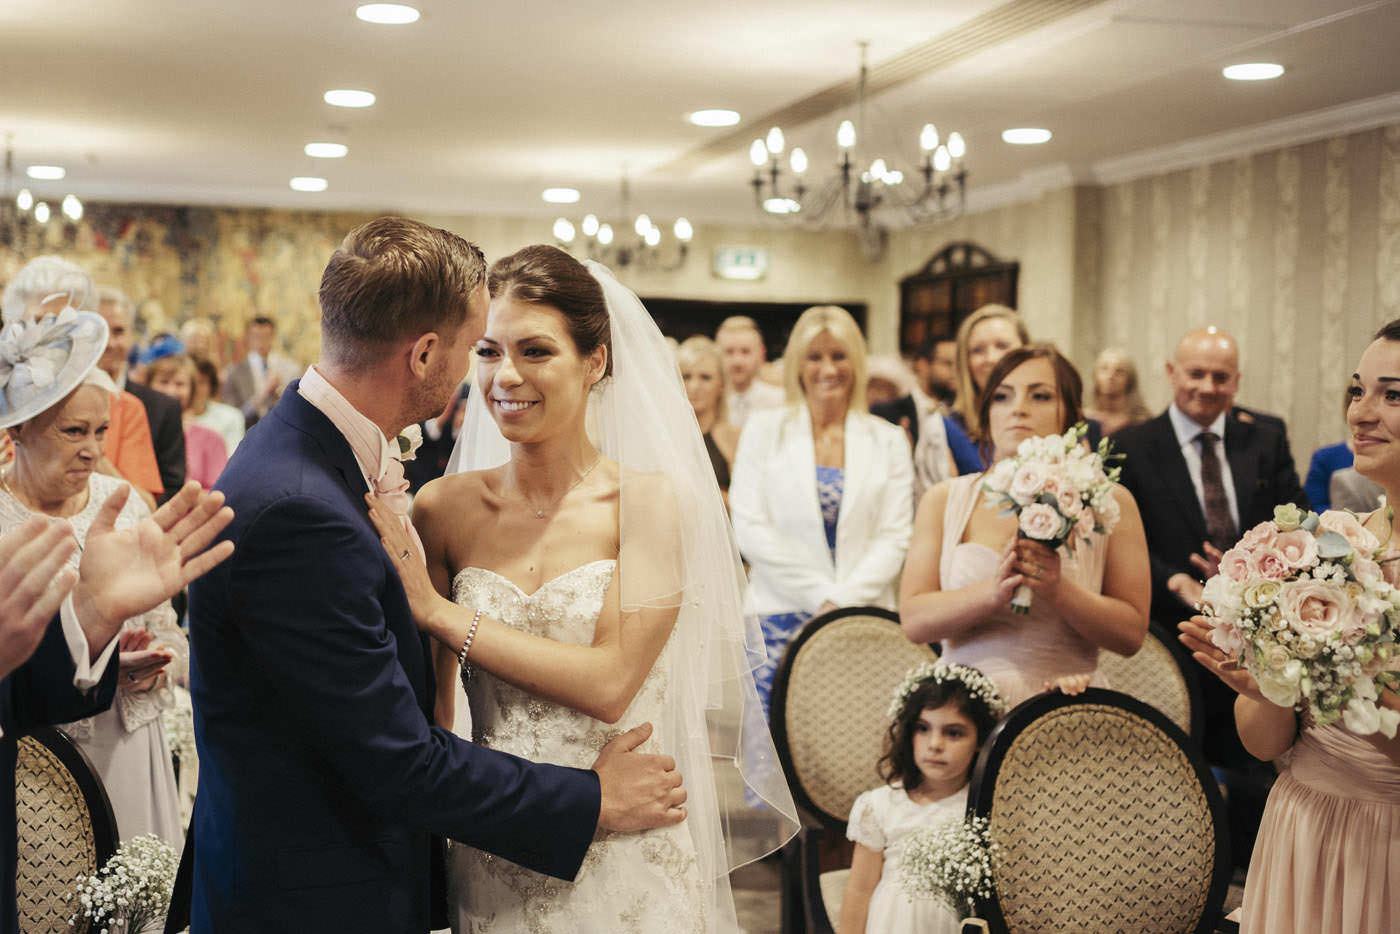 lukeemily foxhills wedding photographer 0056